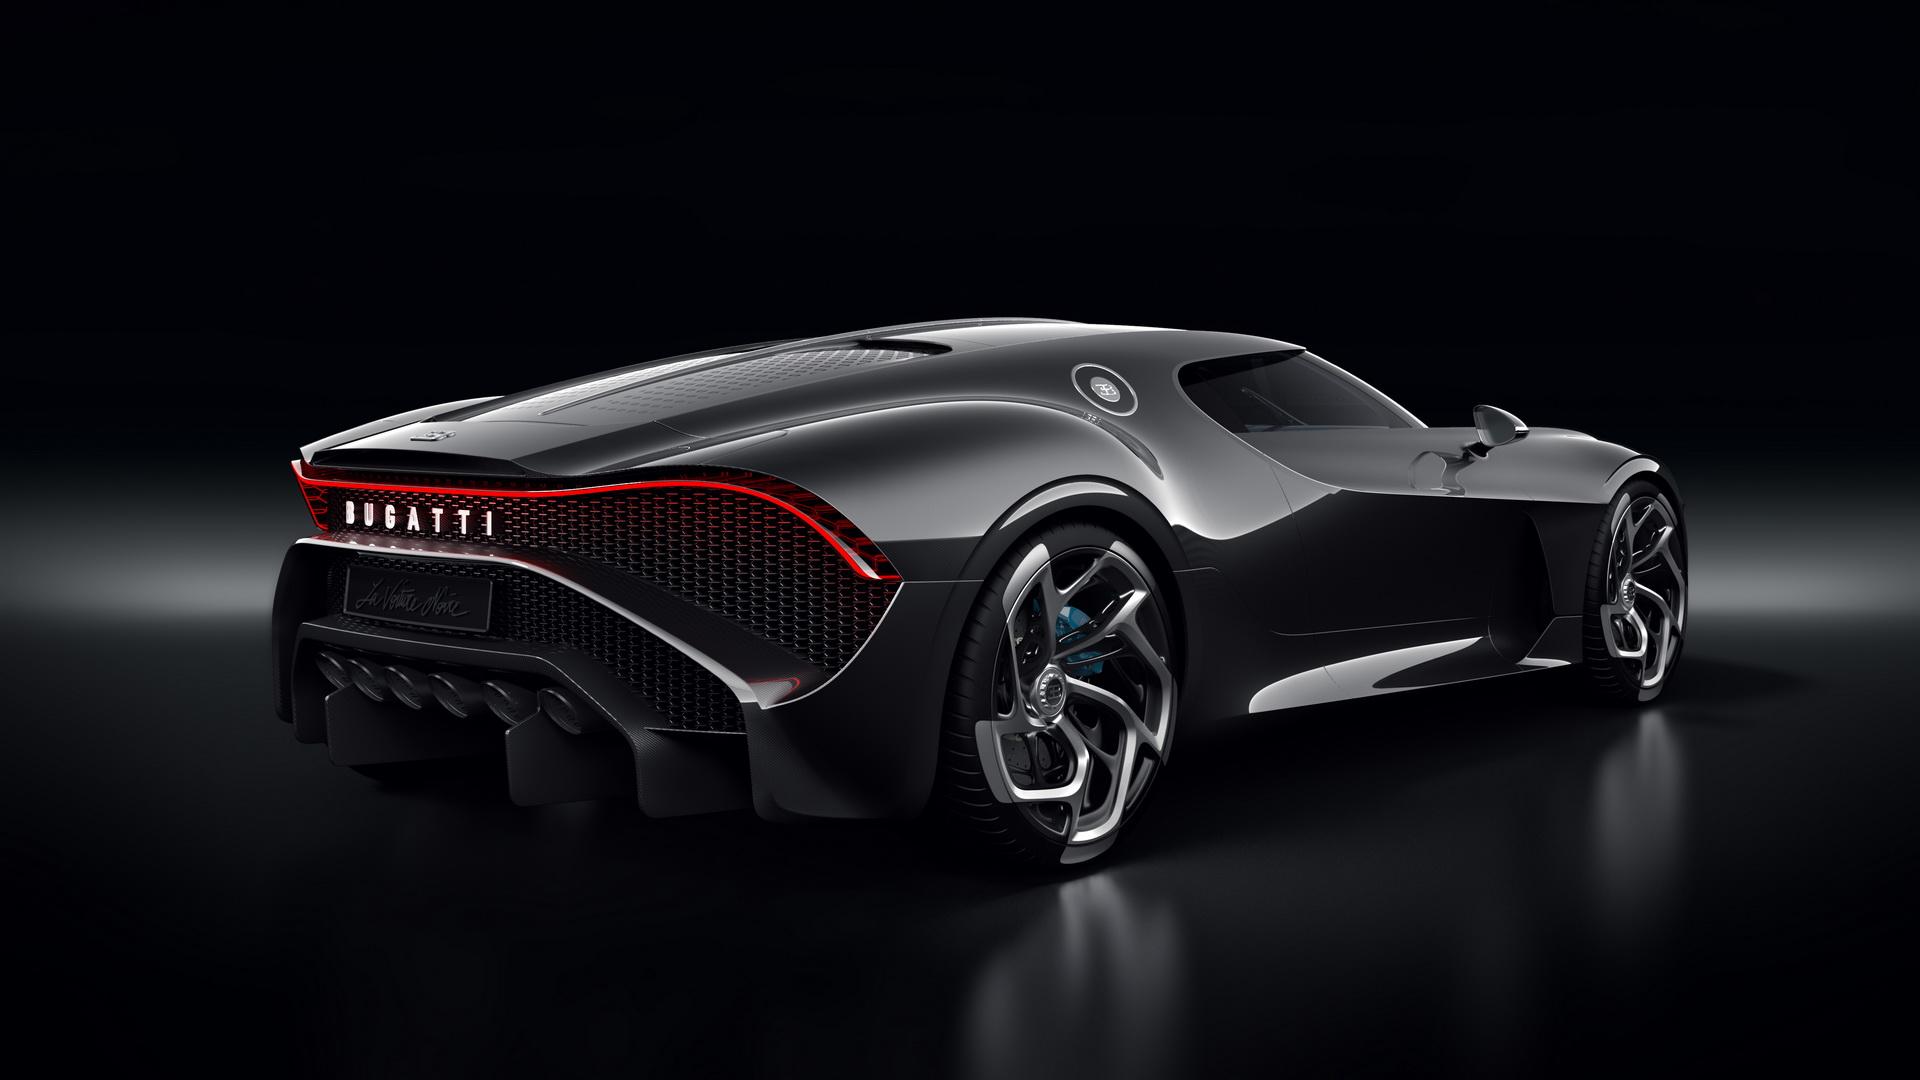 4d8ae816-2019-bugatti-la-voiture-noire-4.jpg